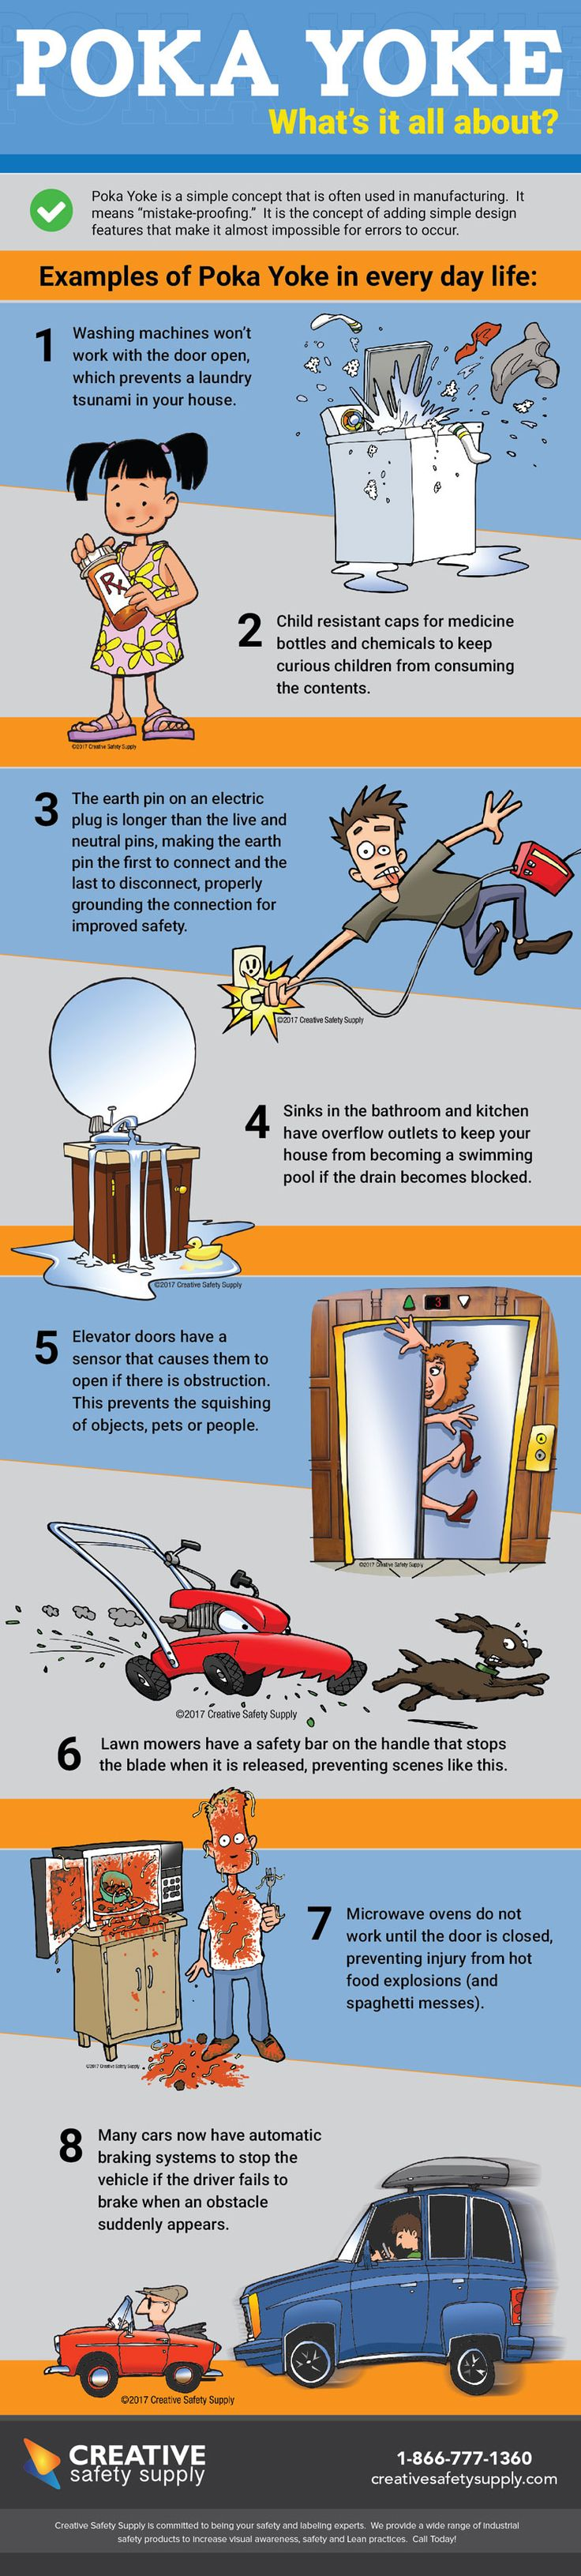 What Is Poka Yoke? - Infographic